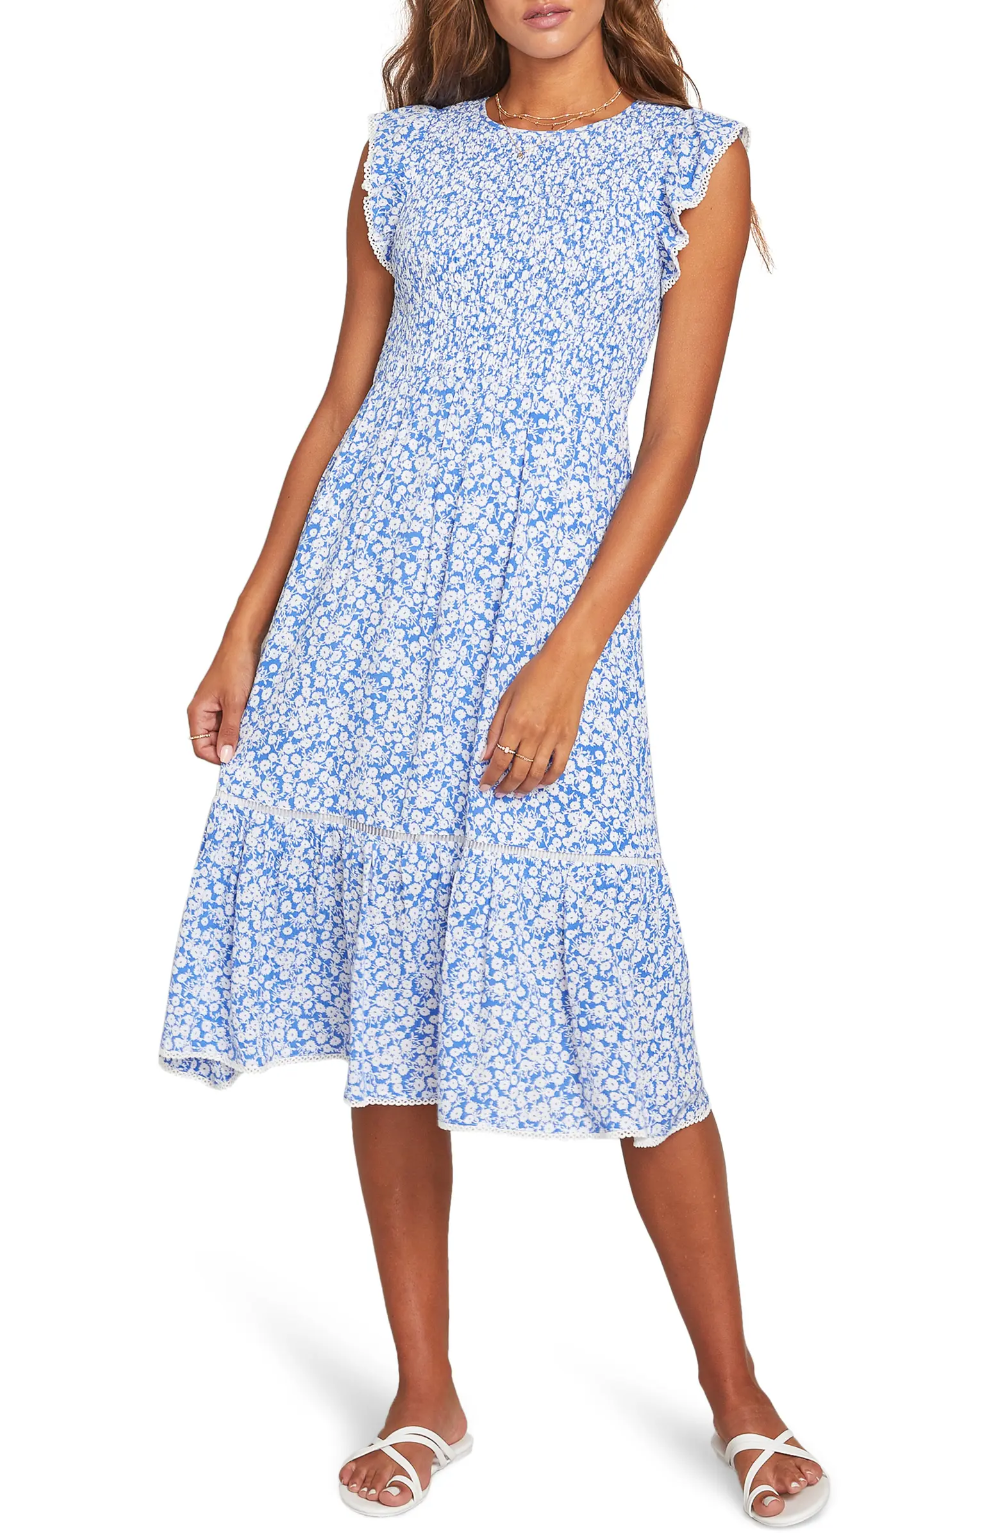 Lost Wander Pick Me Floral Smocked Dress Nordstrom In 2021 Nordstrom Dresses Dresses Summer Day Dresses [ 1533 x 1000 Pixel ]